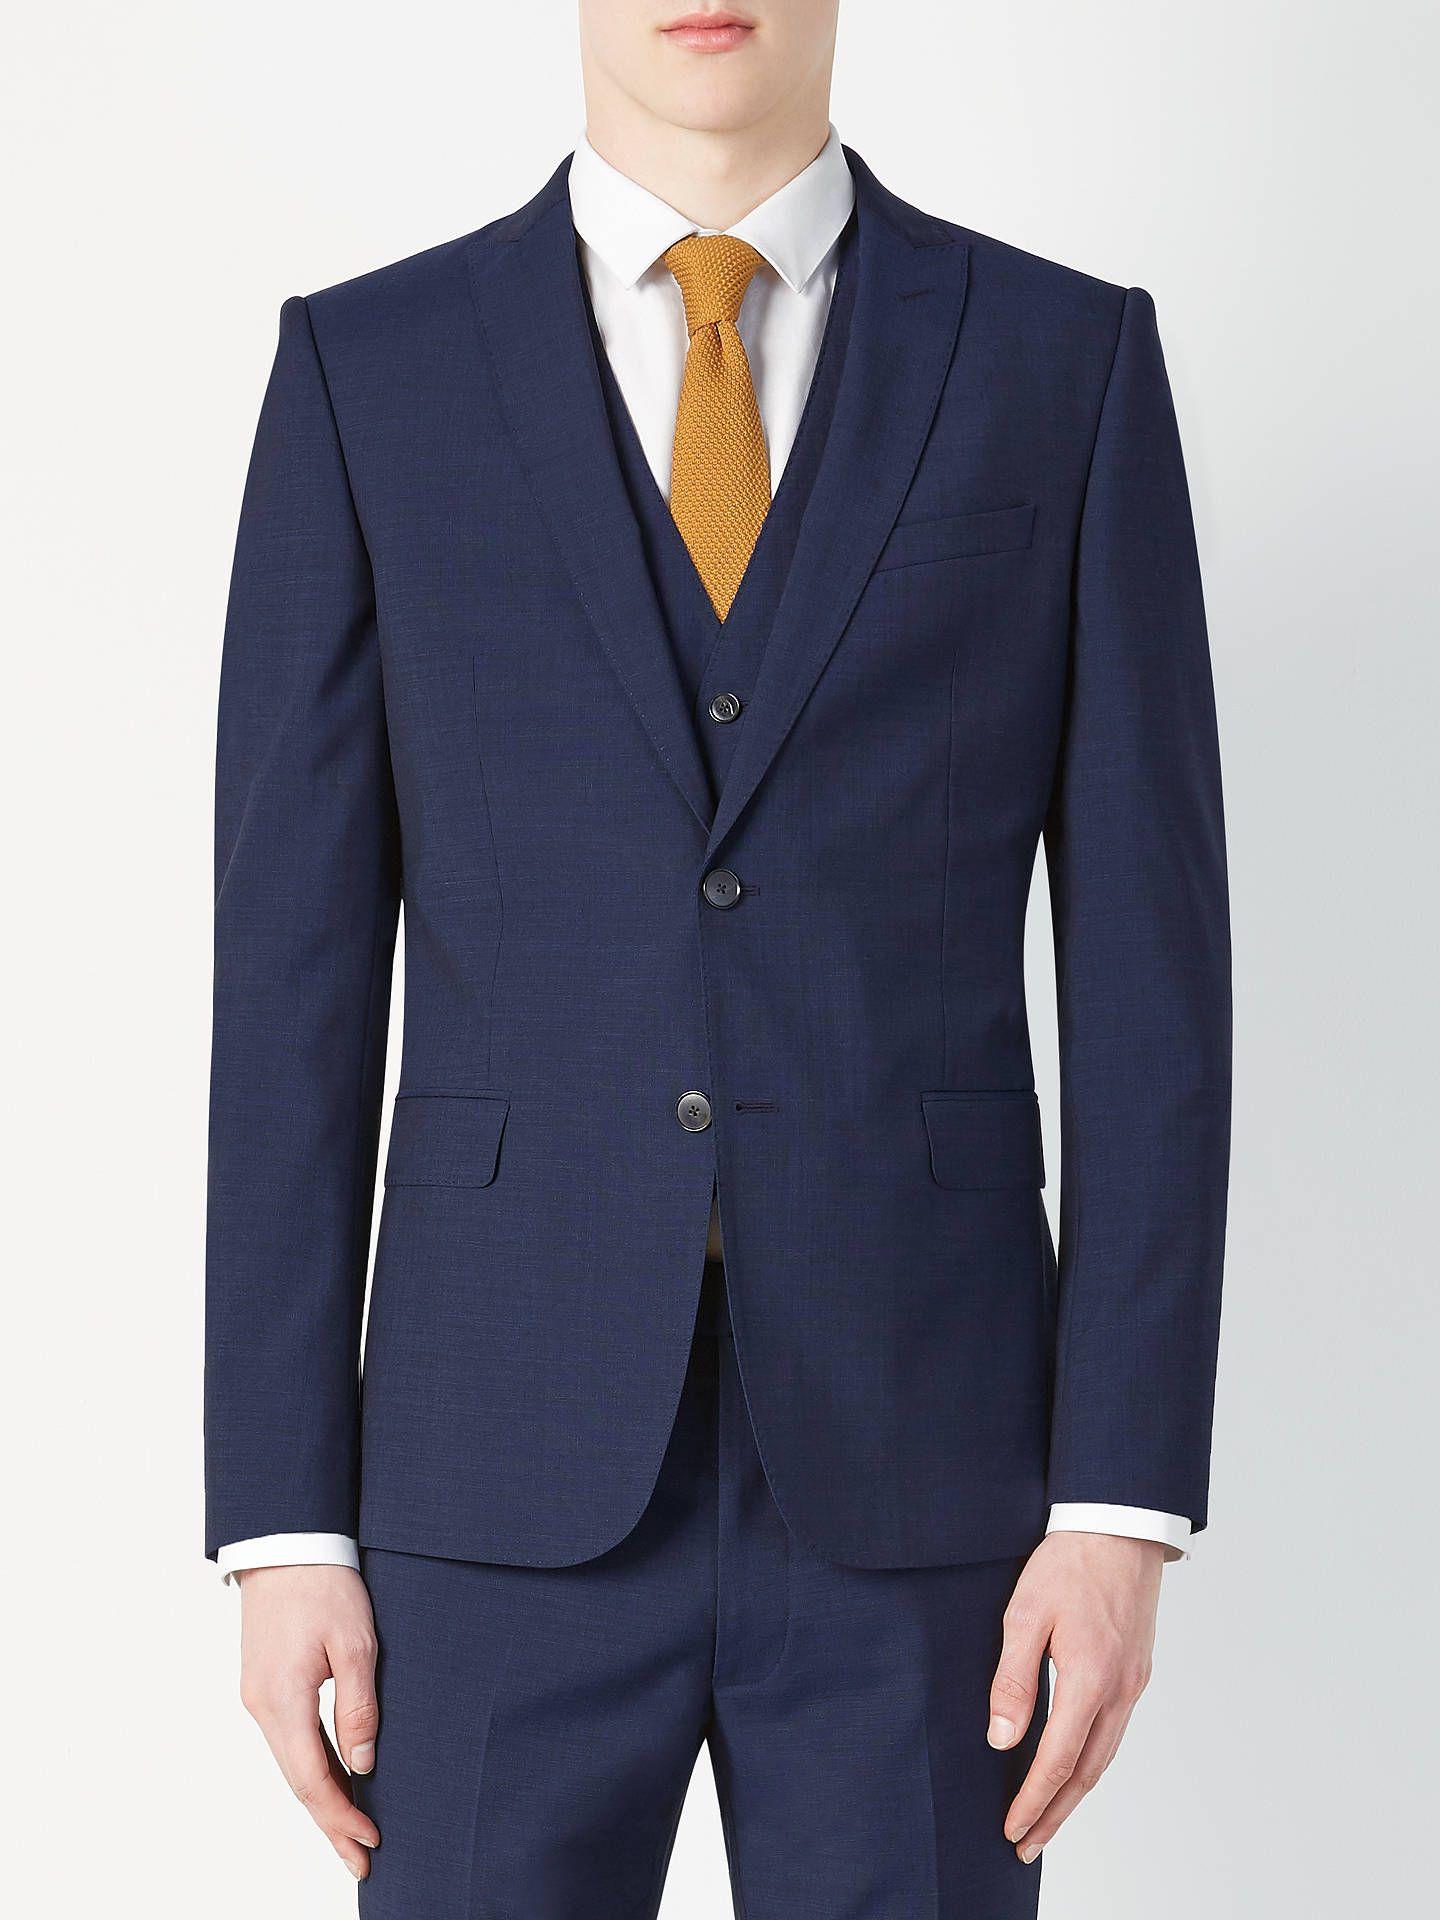 a24d90ca3a9 BuyKin Pindot Slim Fit Suit Jacket